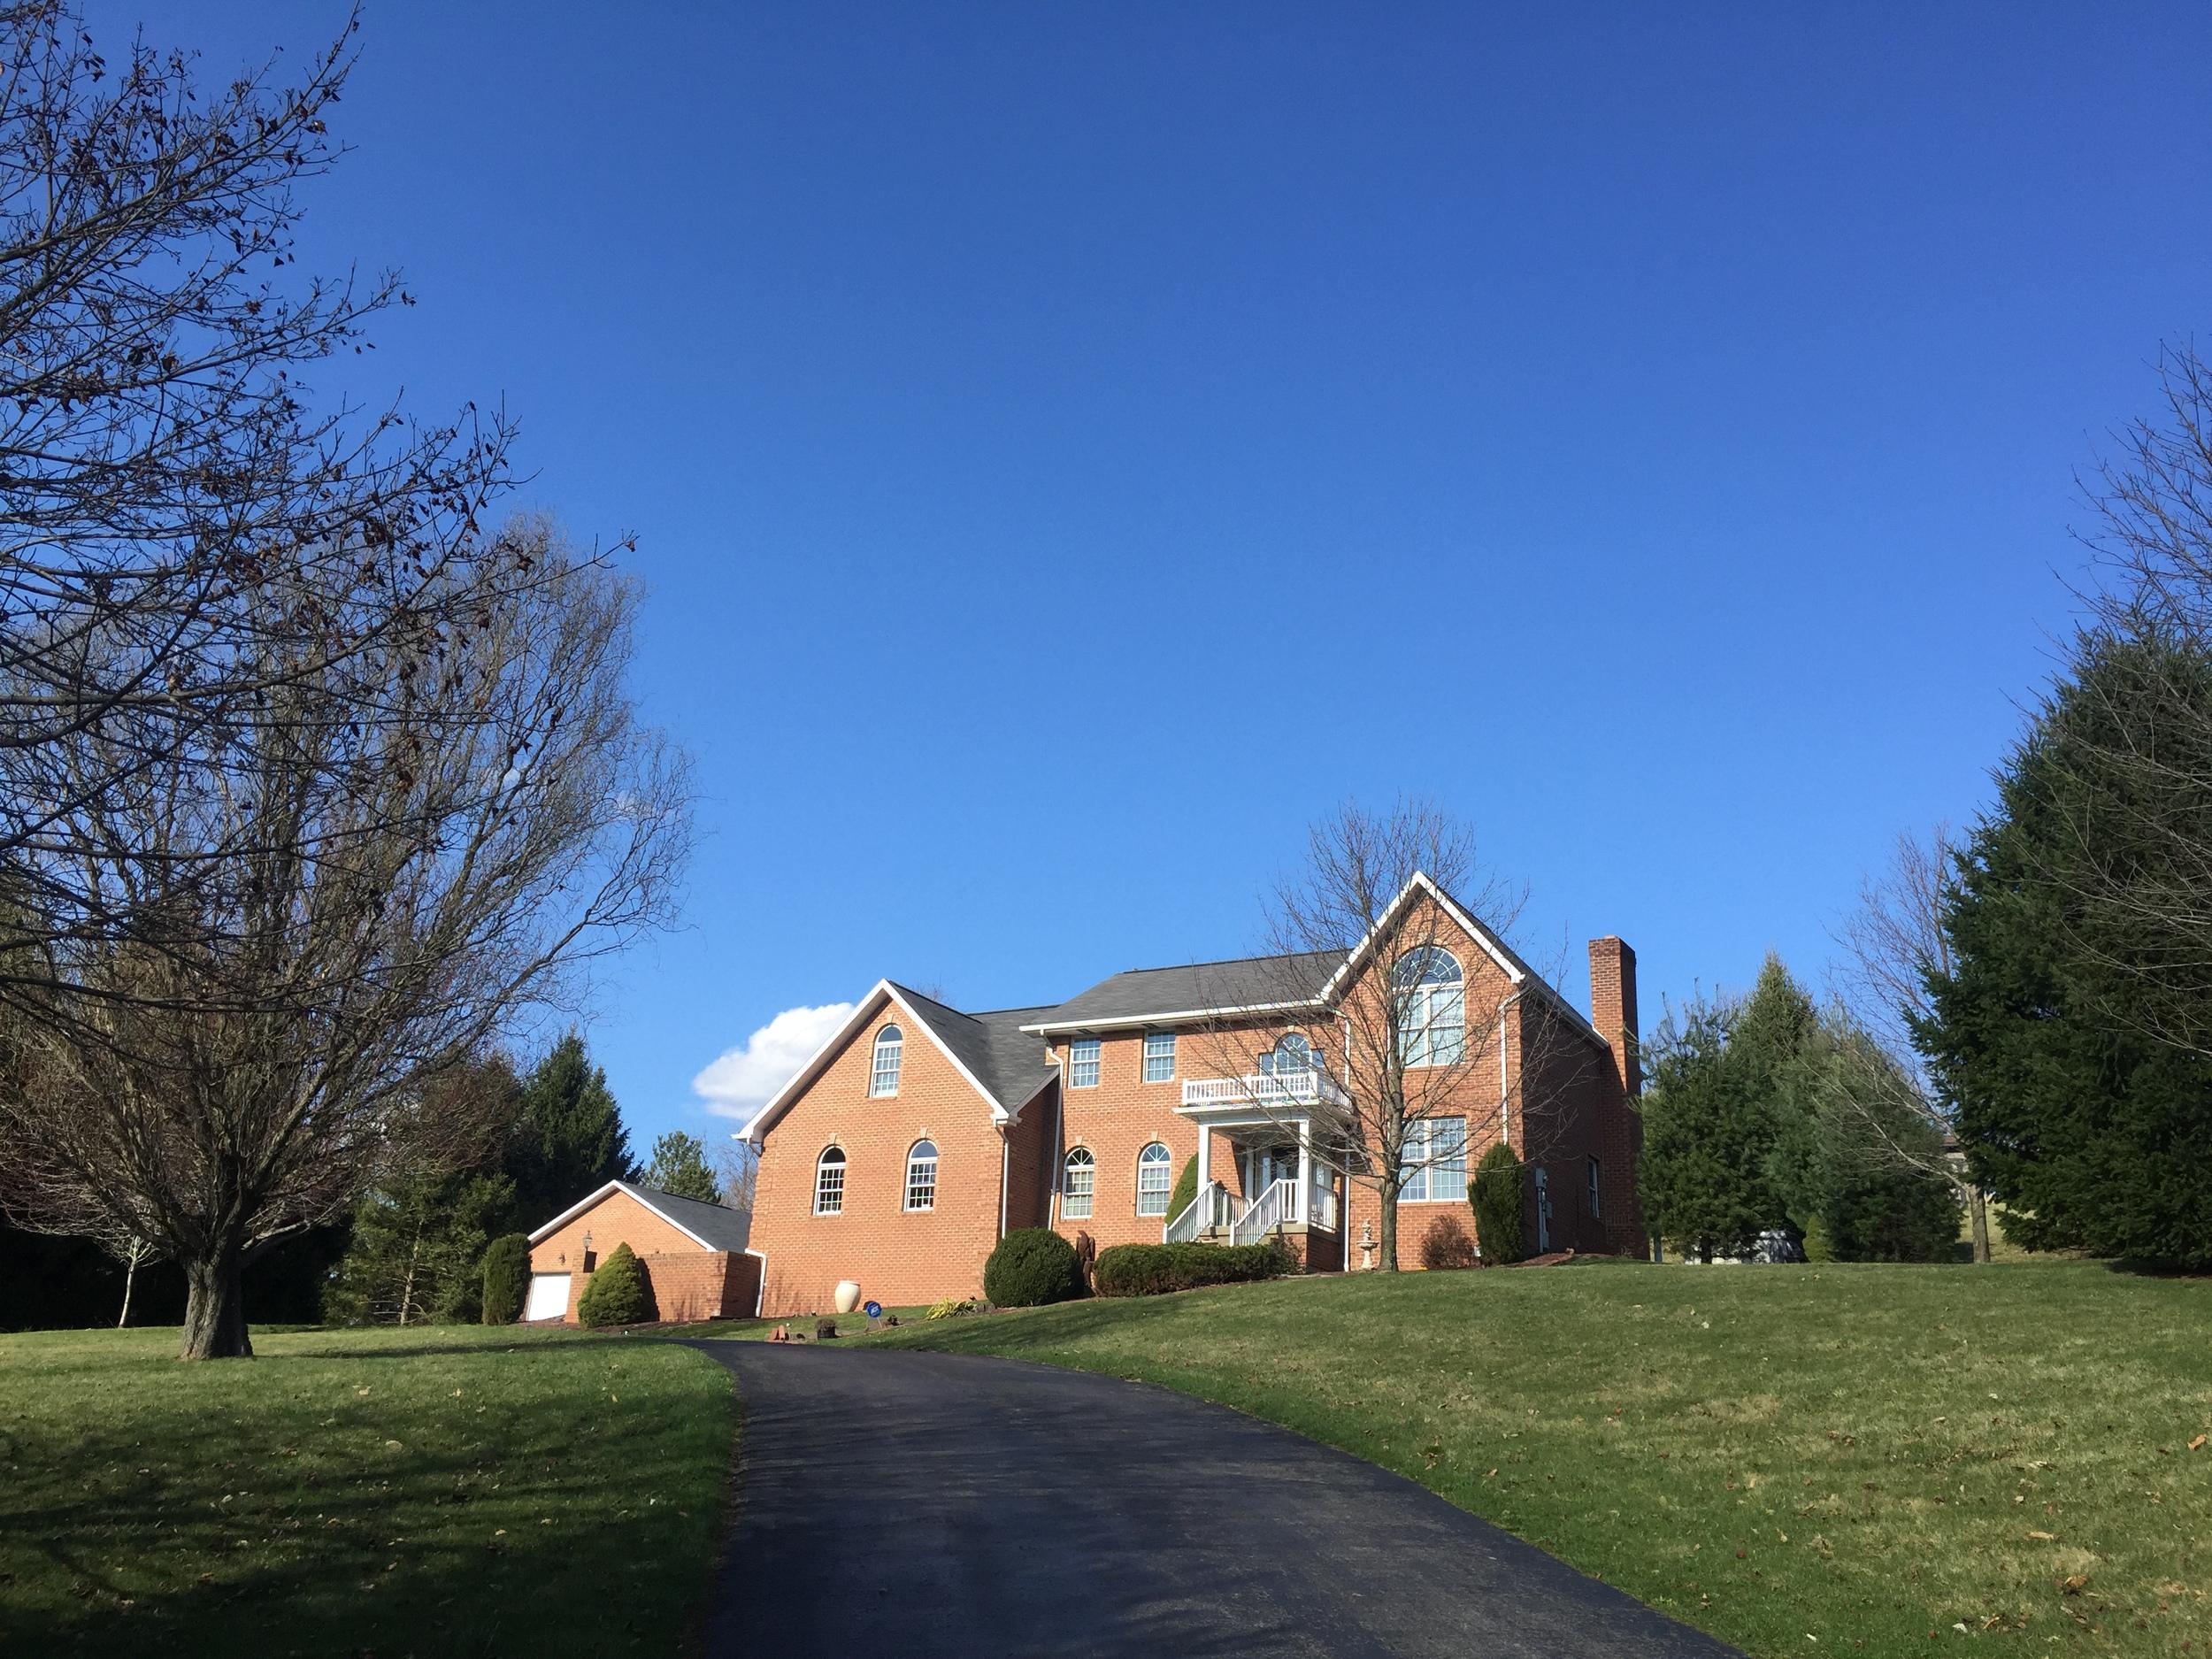 Stonegate Housing Development - Rostraver, PA